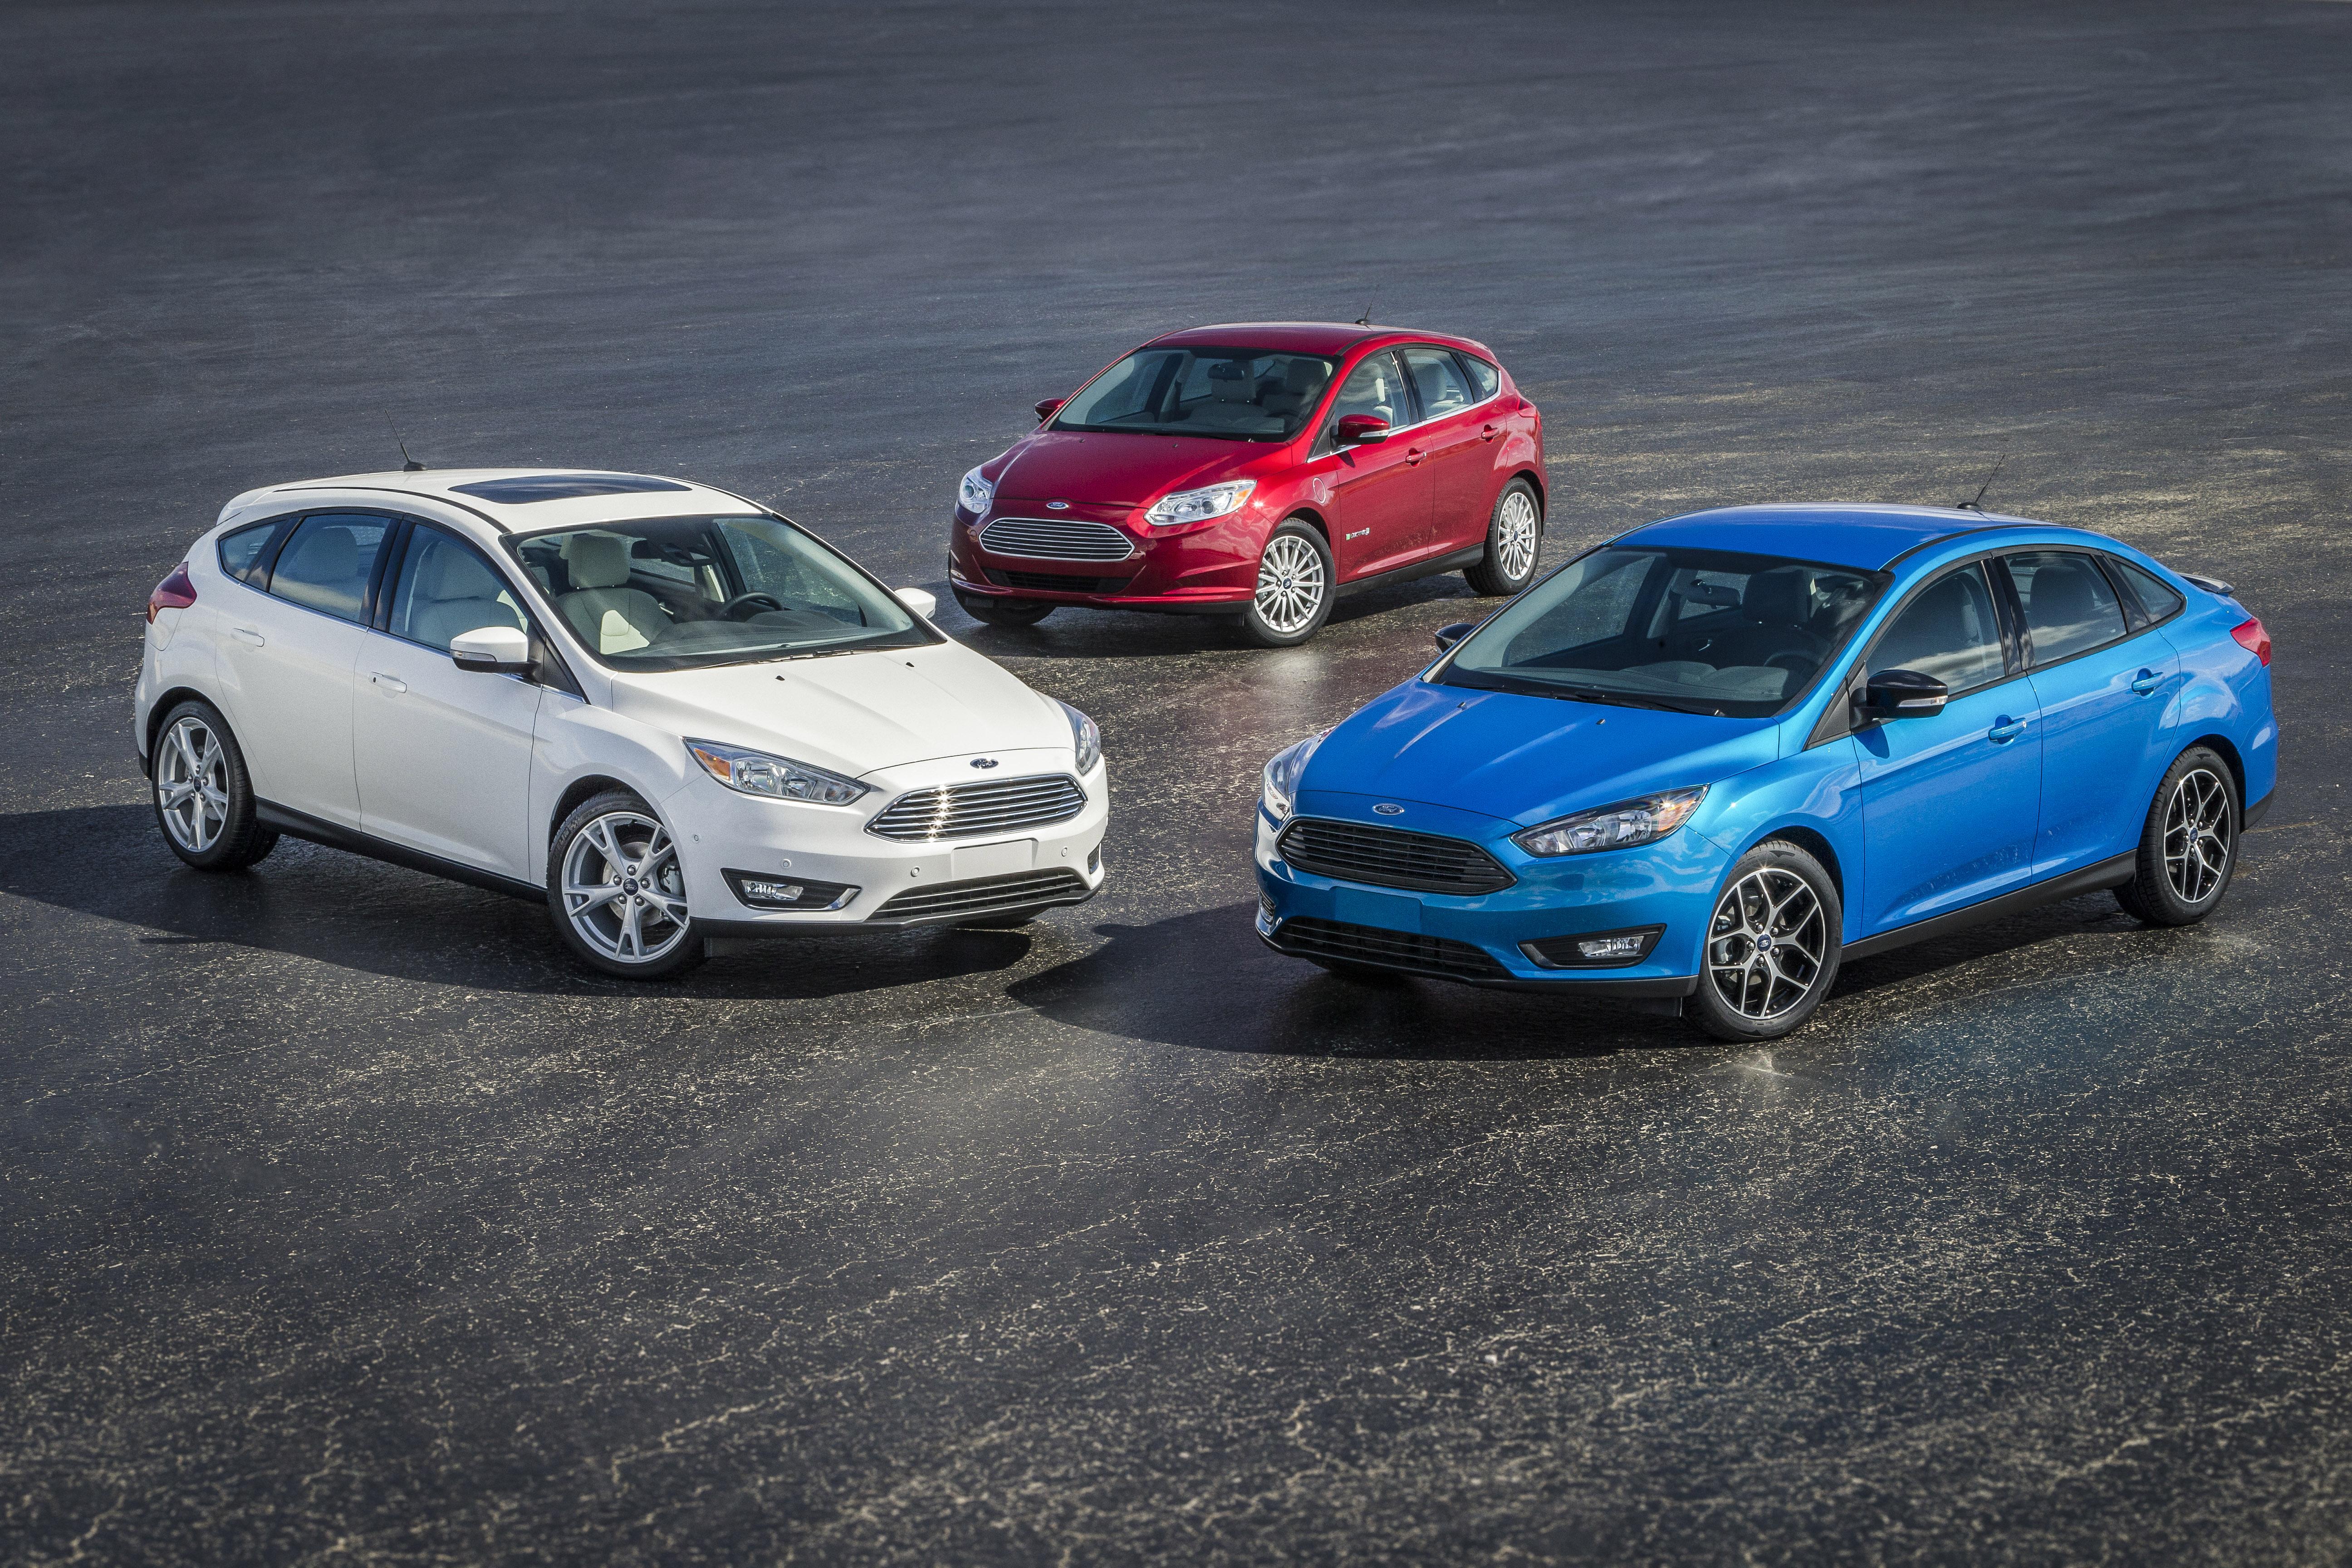 expert heyman drive st ford review of test focus dan